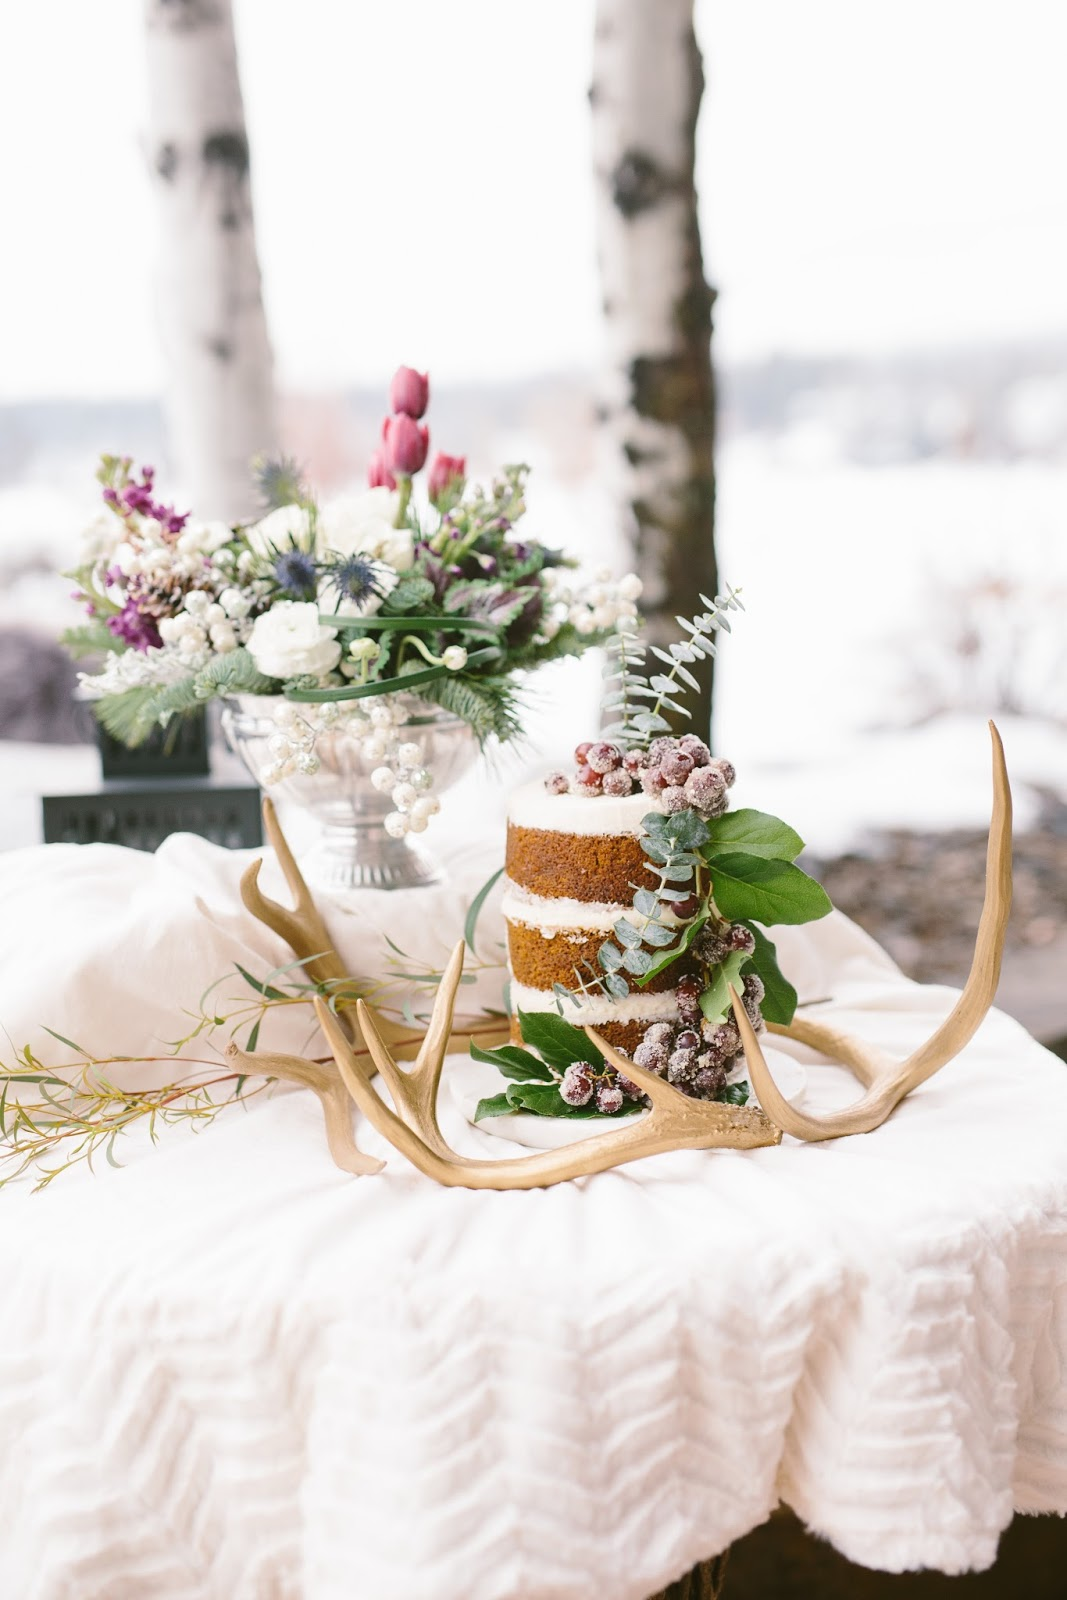 Winter wedding cake / Photography by Dina Remi